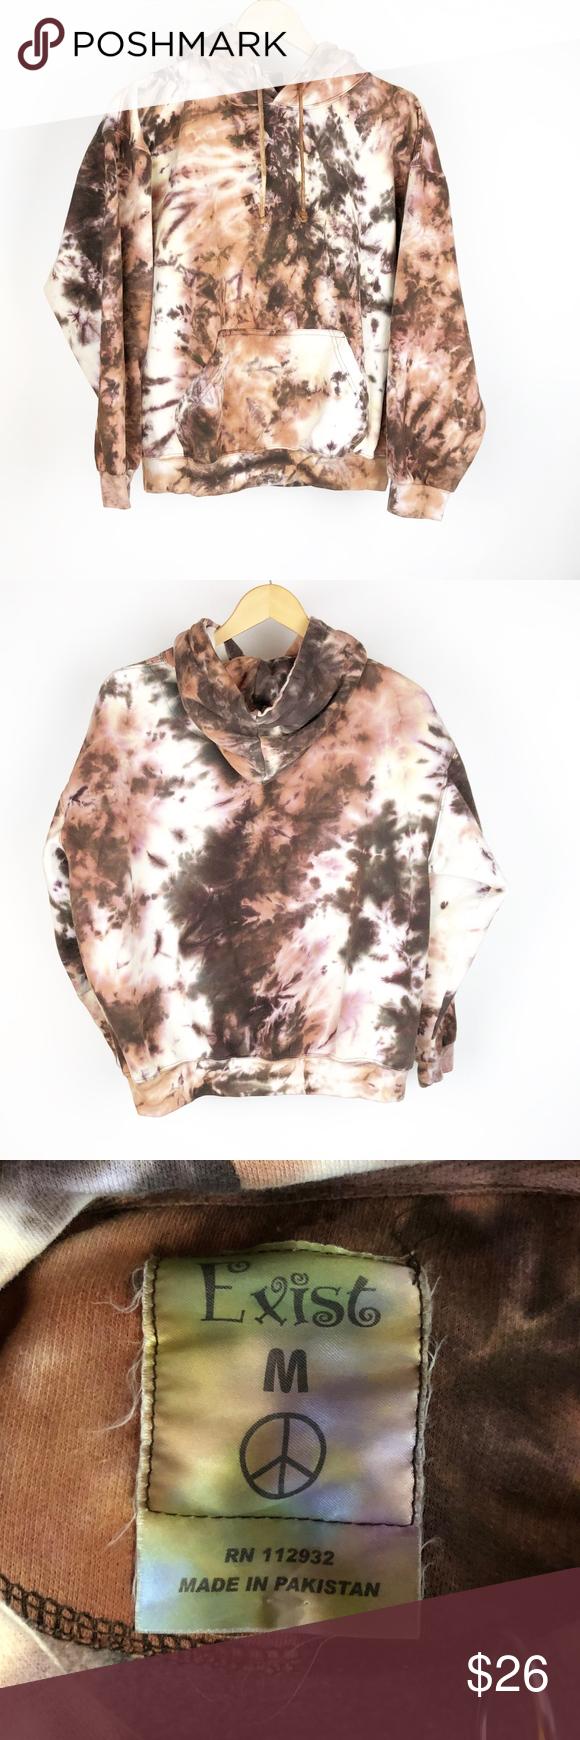 Exist Tie Dye Lace Up Sweatshirt Hoodie Sz Medium Sweatshirts Hoodie Tie Dye Sweatshirts [ 1740 x 580 Pixel ]